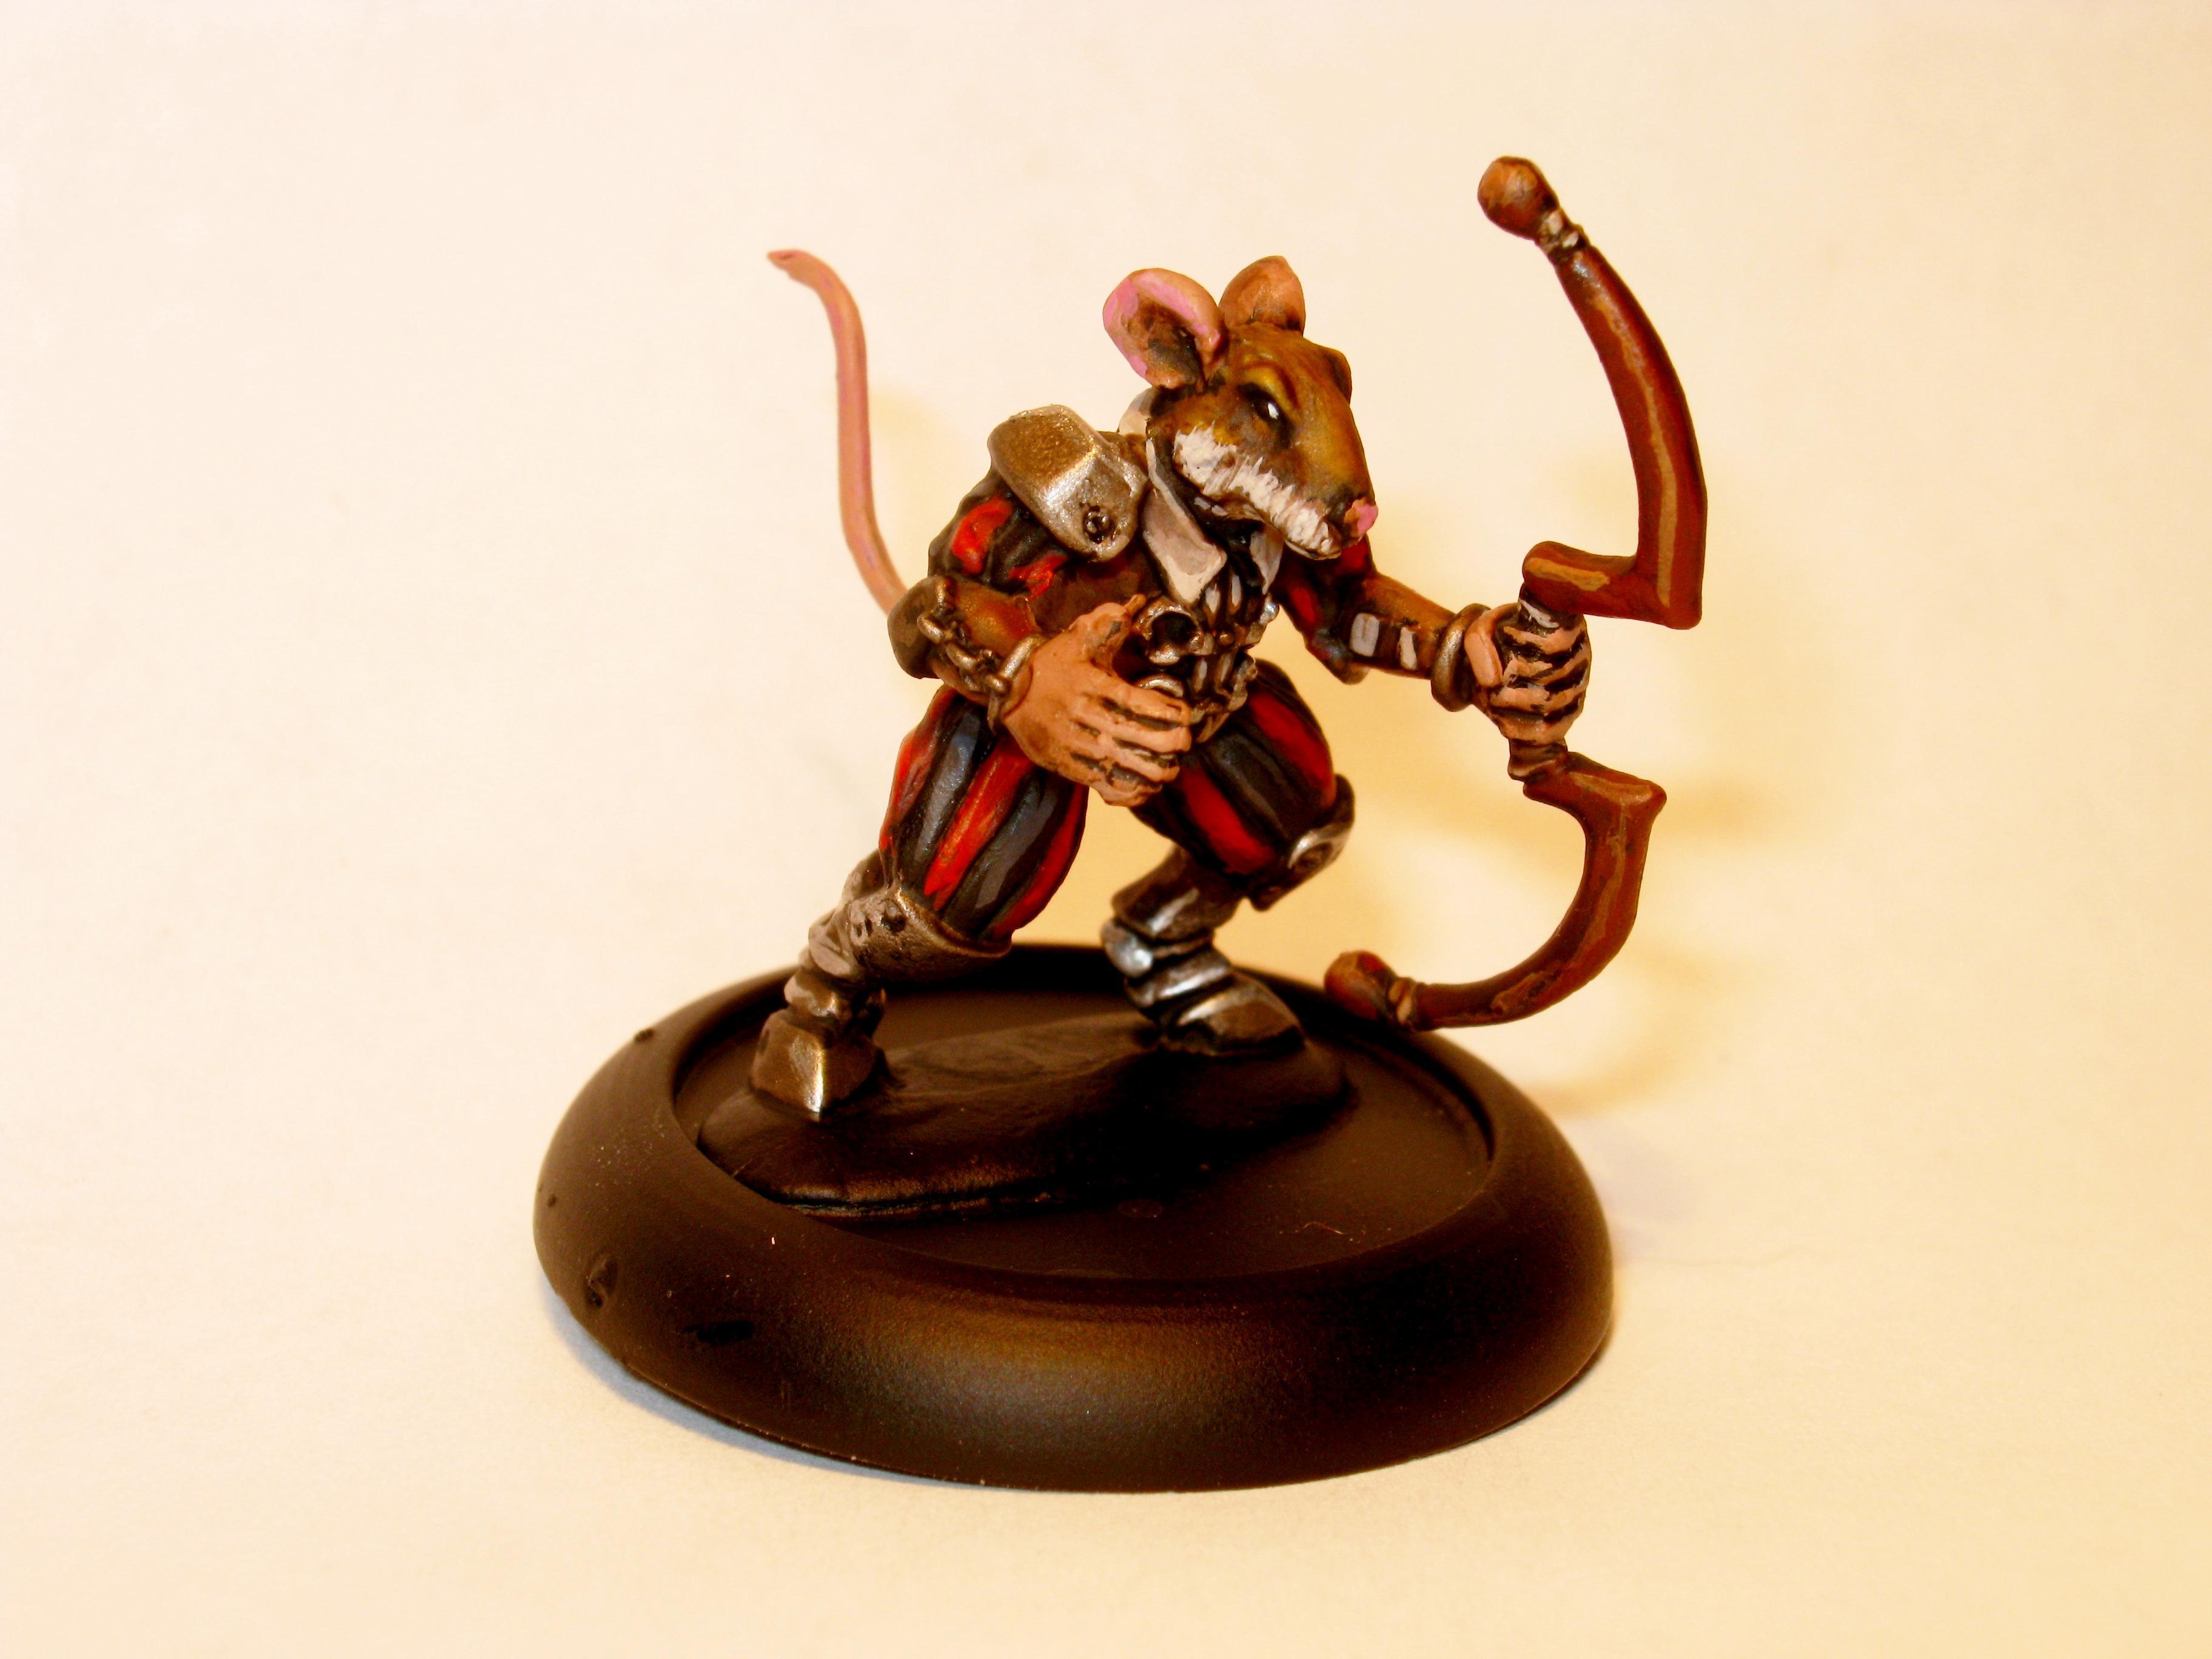 Brushfire, Mare-civitas, Mouse Conscript